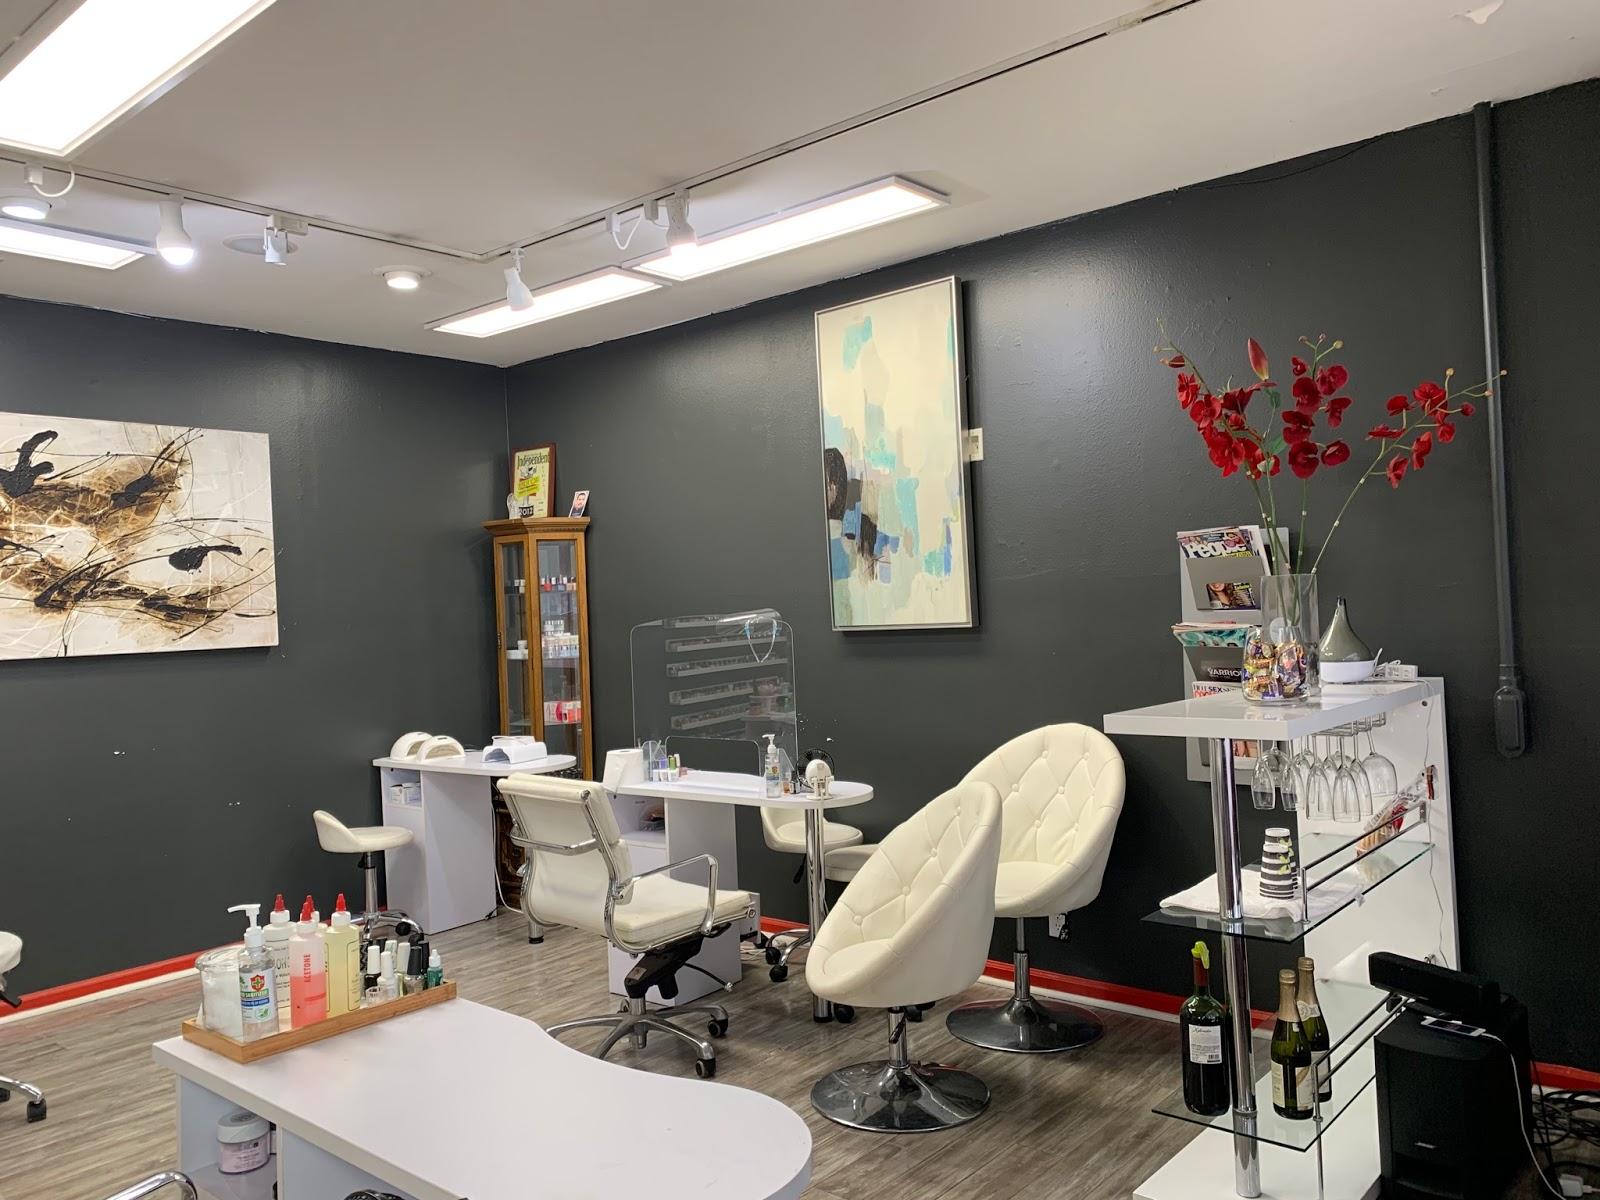 TLC Nail Lounge | Nail salon 93101 | Lower State Santa Barbara